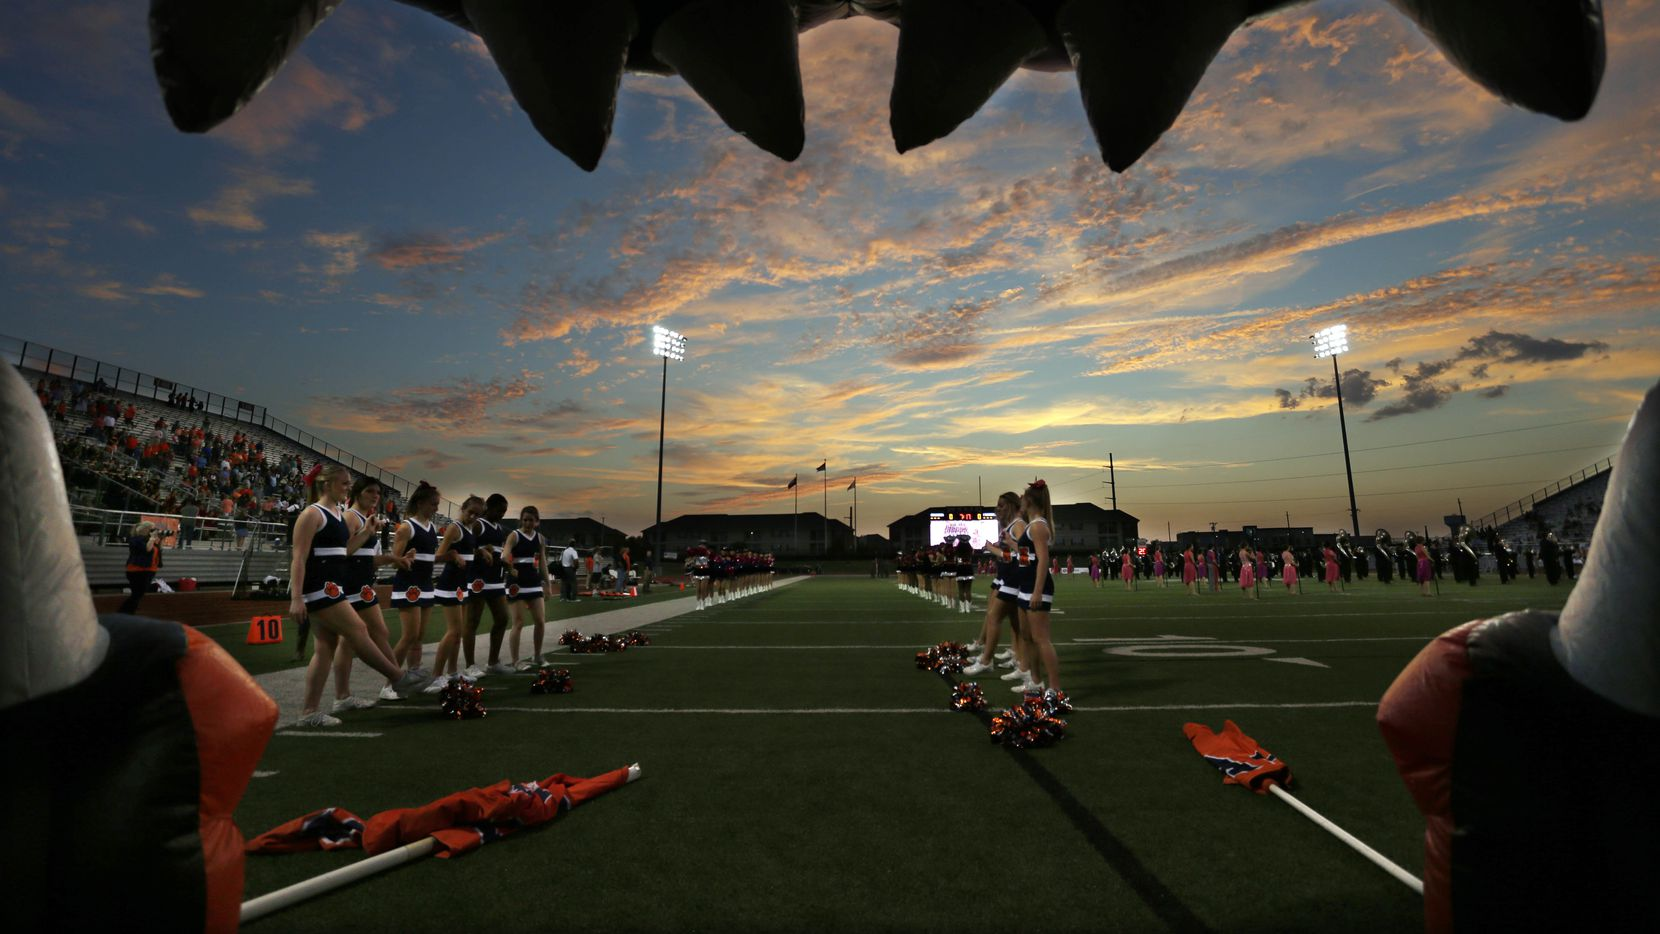 Generic high school football photo.